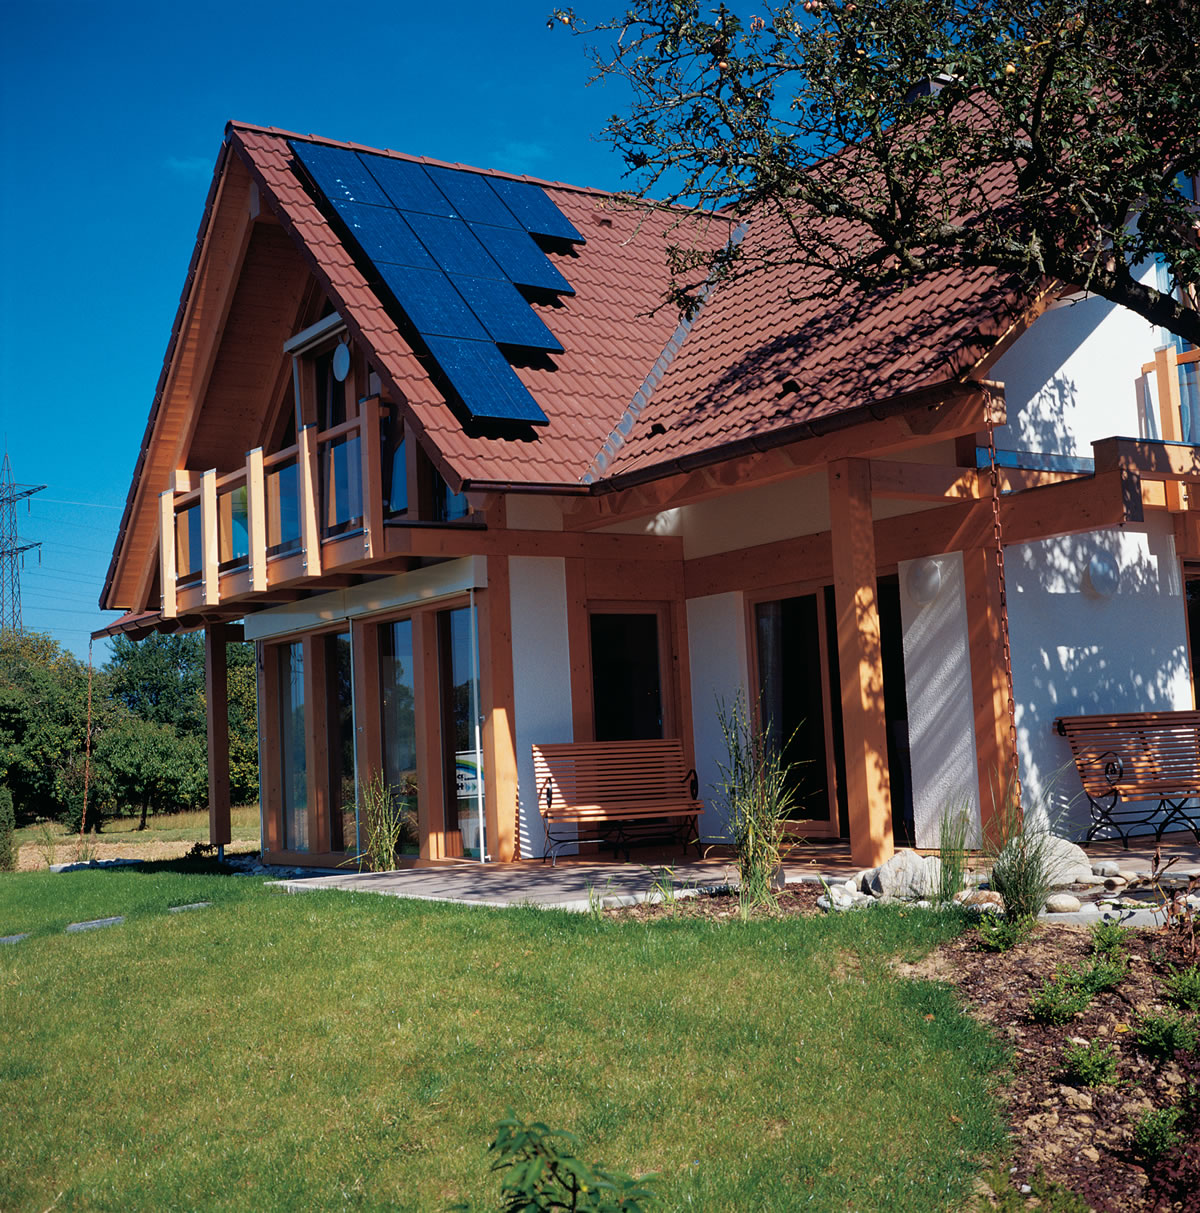 triwatt gmbh photovoltaik. Black Bedroom Furniture Sets. Home Design Ideas